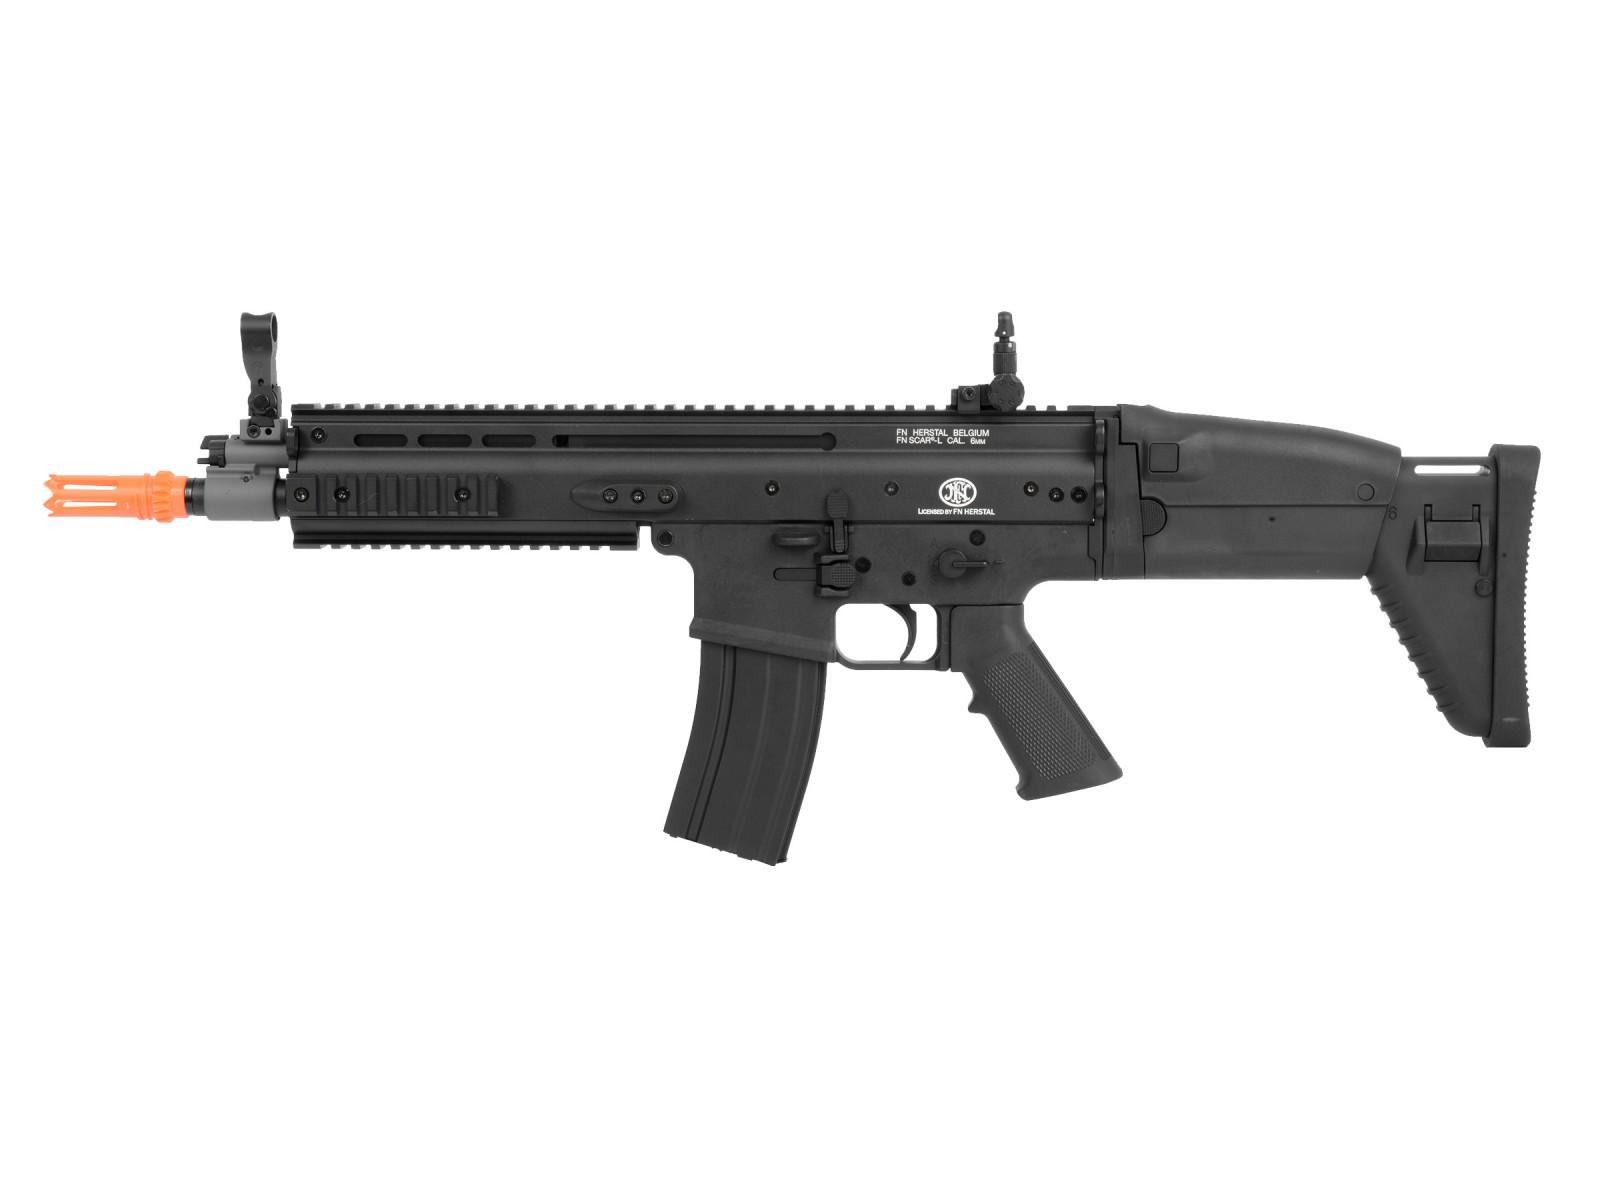 FN_SCARL_Metal_AEG_Airsoft_Rifle_Black_6mm